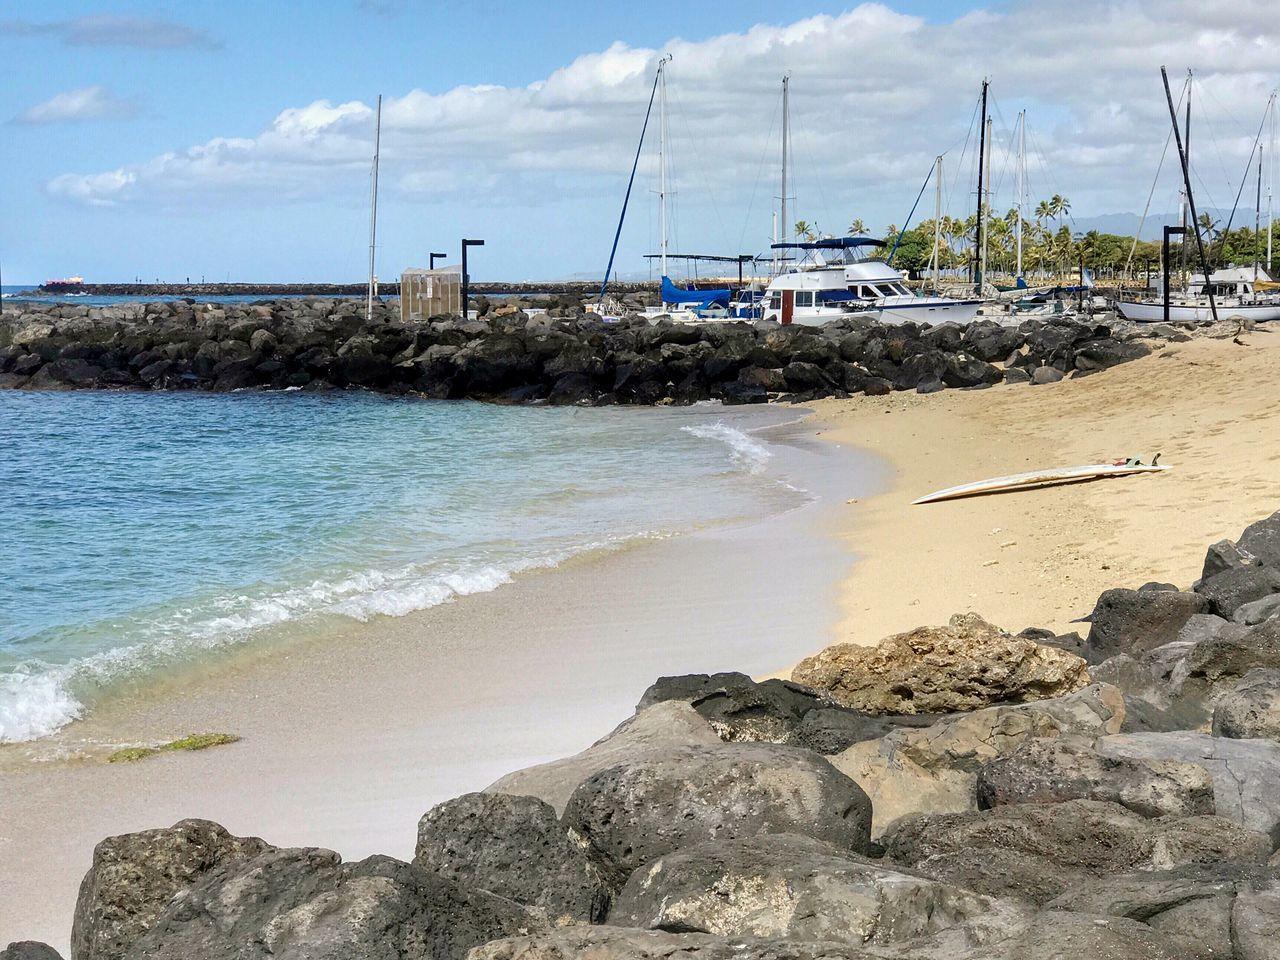 Beach Ocean Boats Shoreline Hawaii Sky IPhoneography IPhone